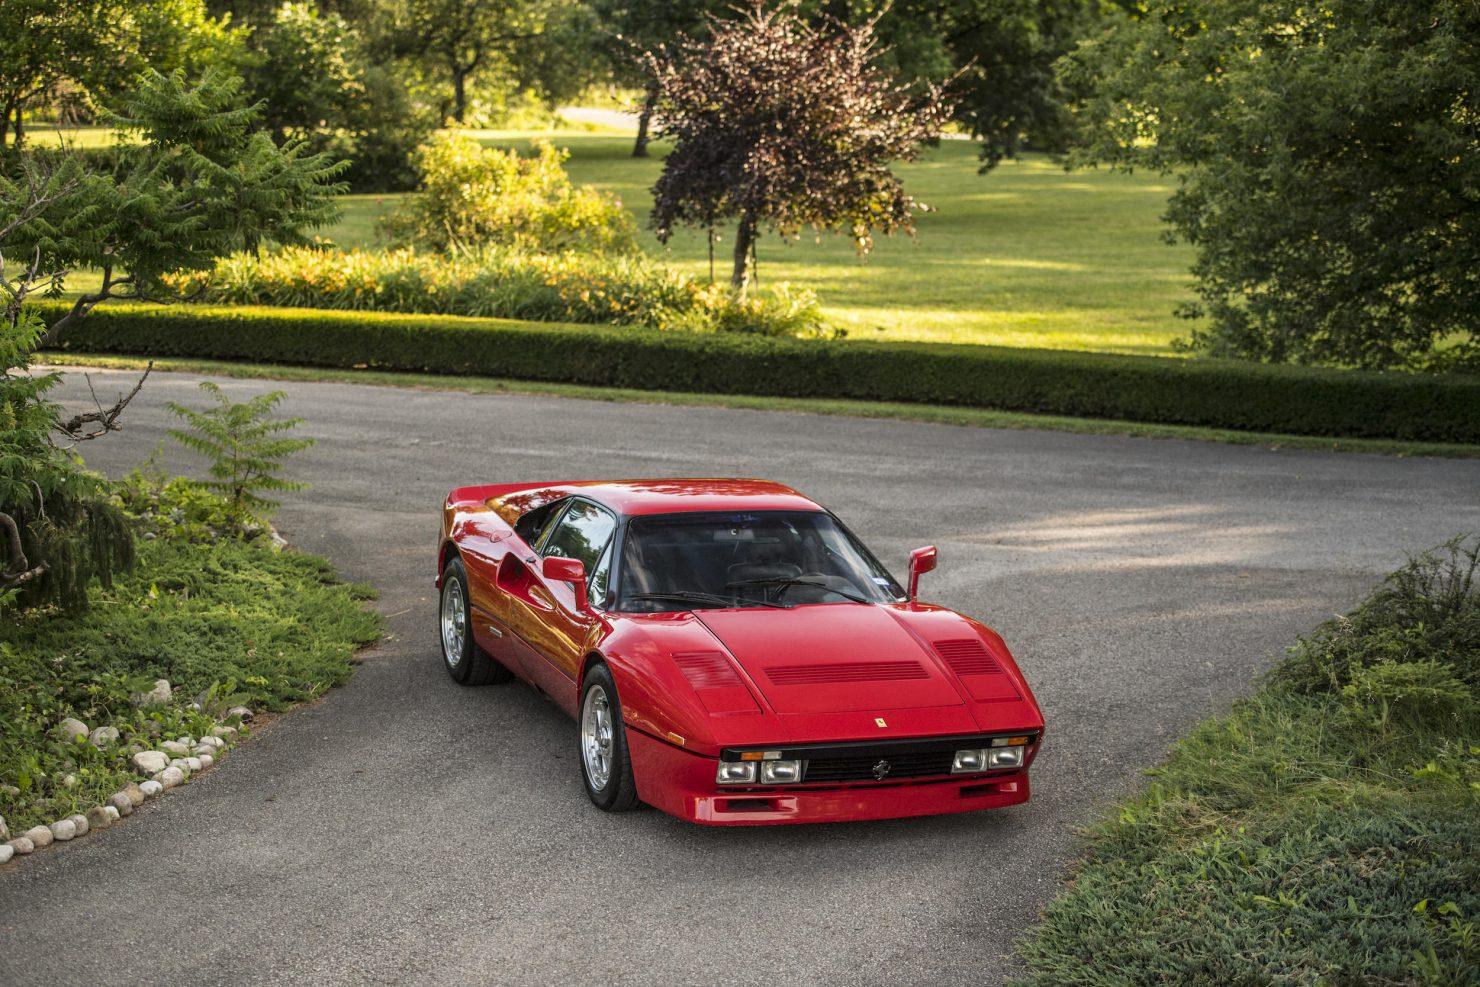 Ferrari 288 GTO 13 1480x987 - 1985 Ferrari 288 GTO